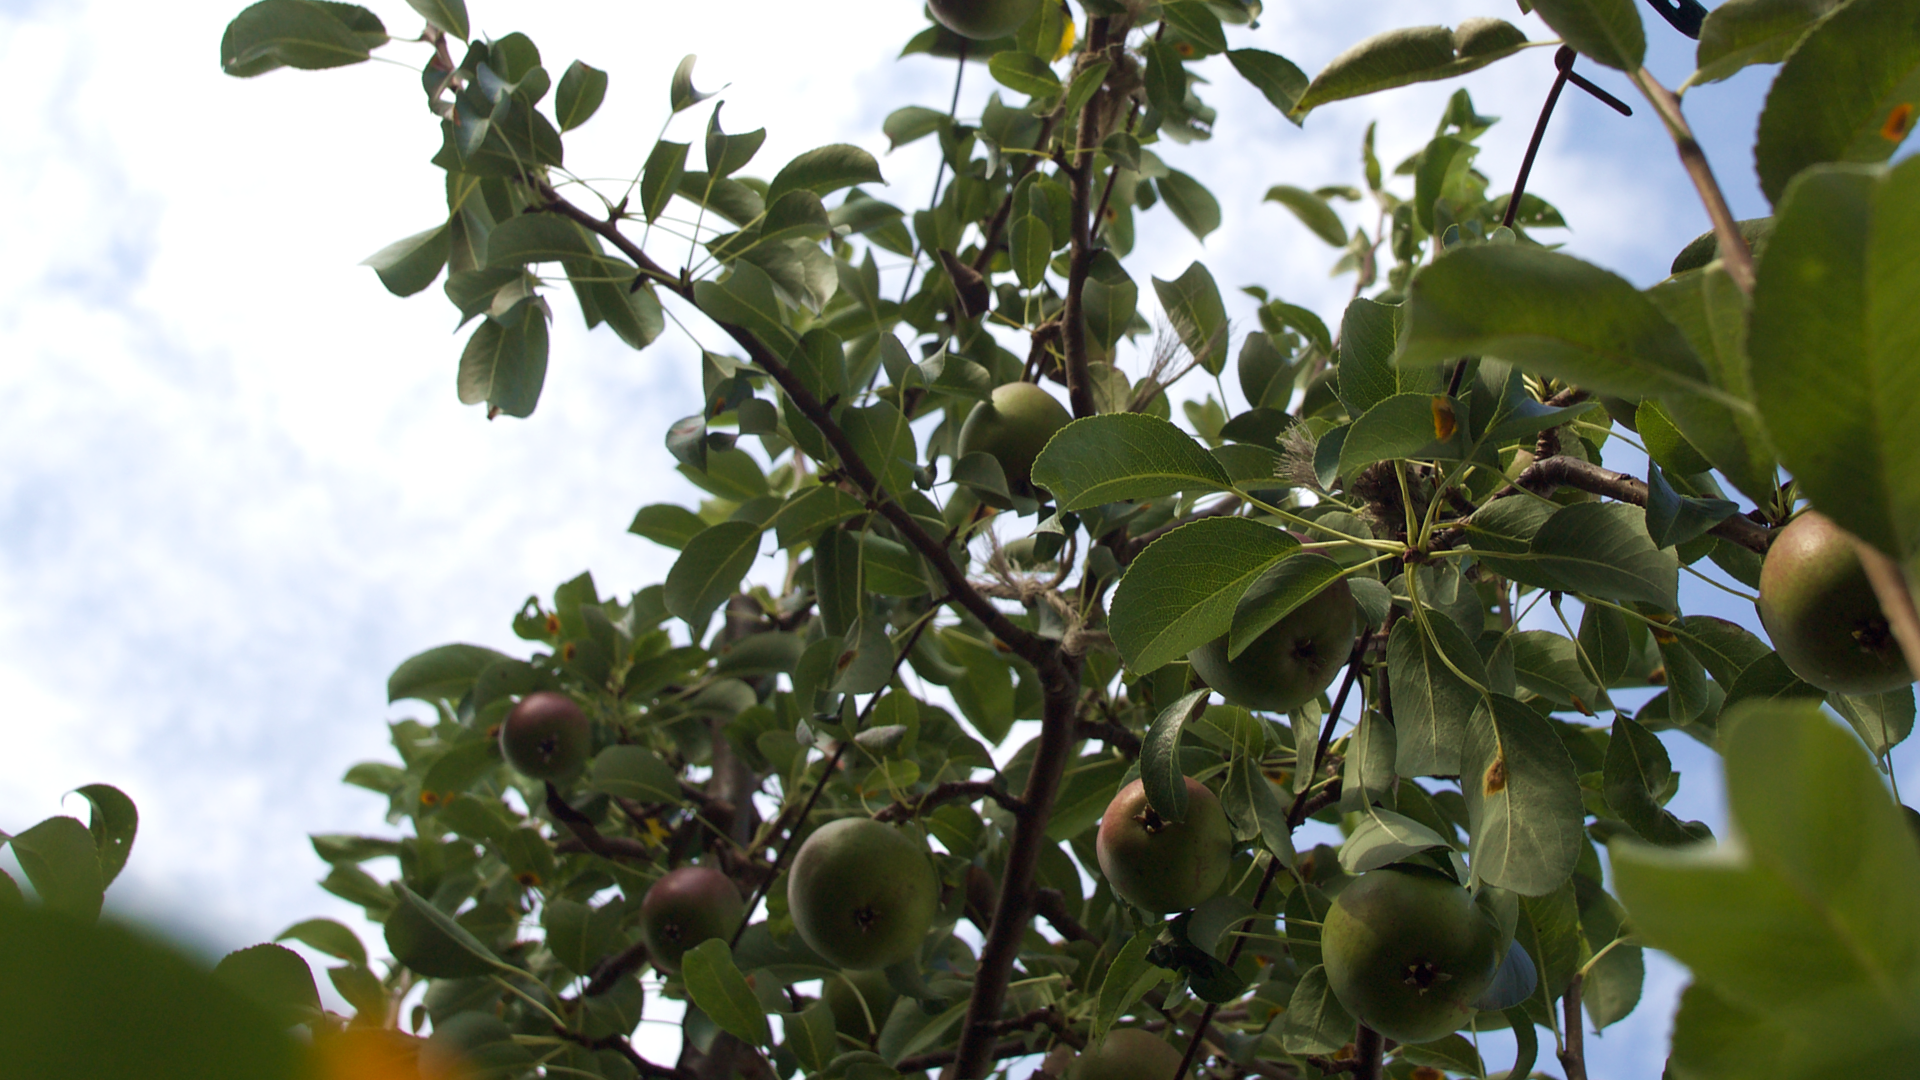 Sider_Obstbäume-Birnen